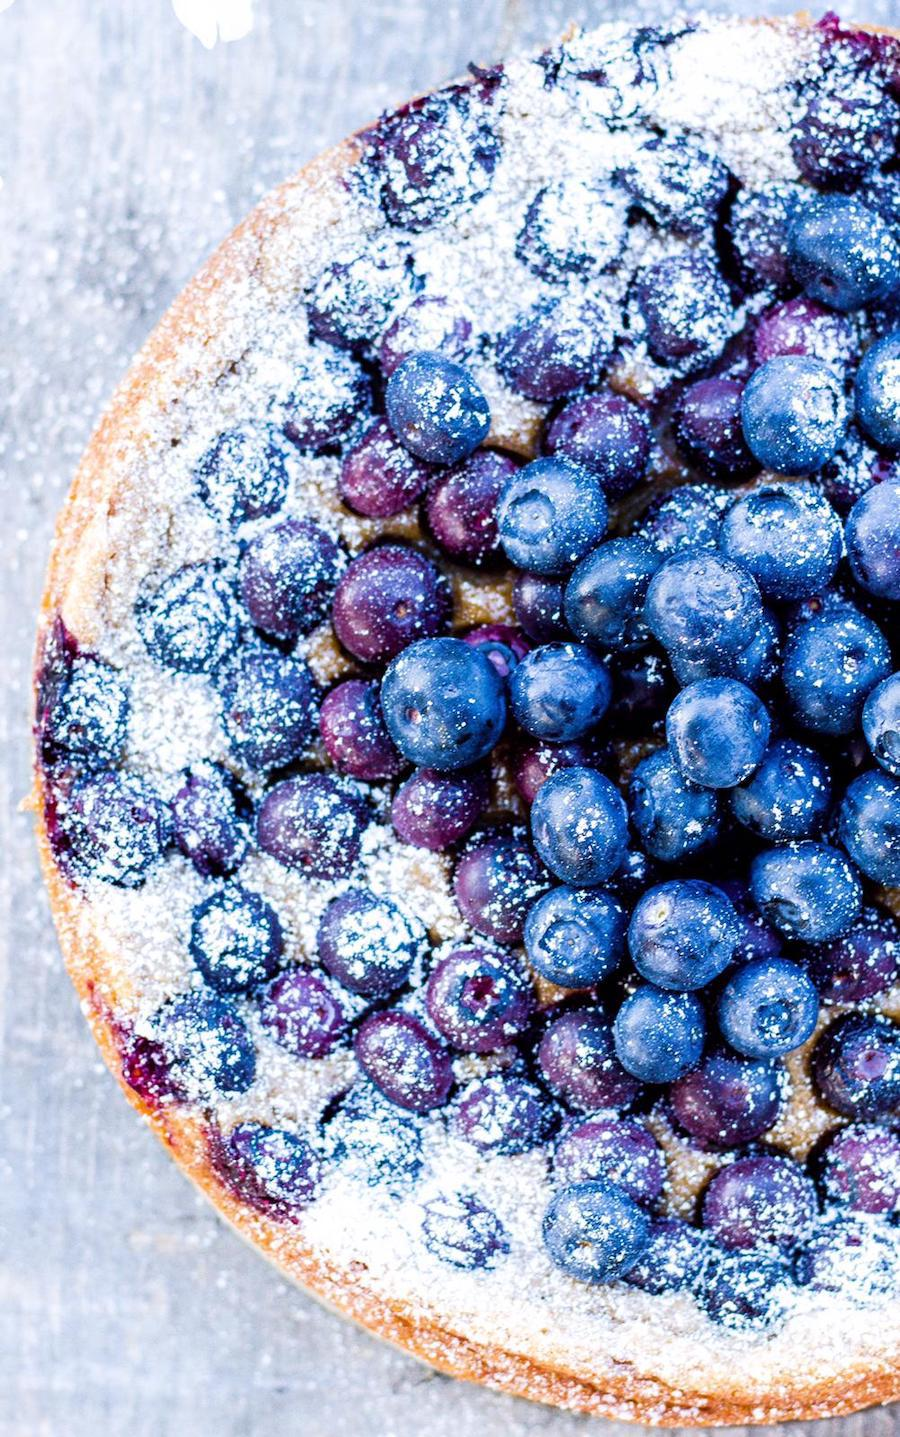 Glutenfree rice pudding blueberry cake